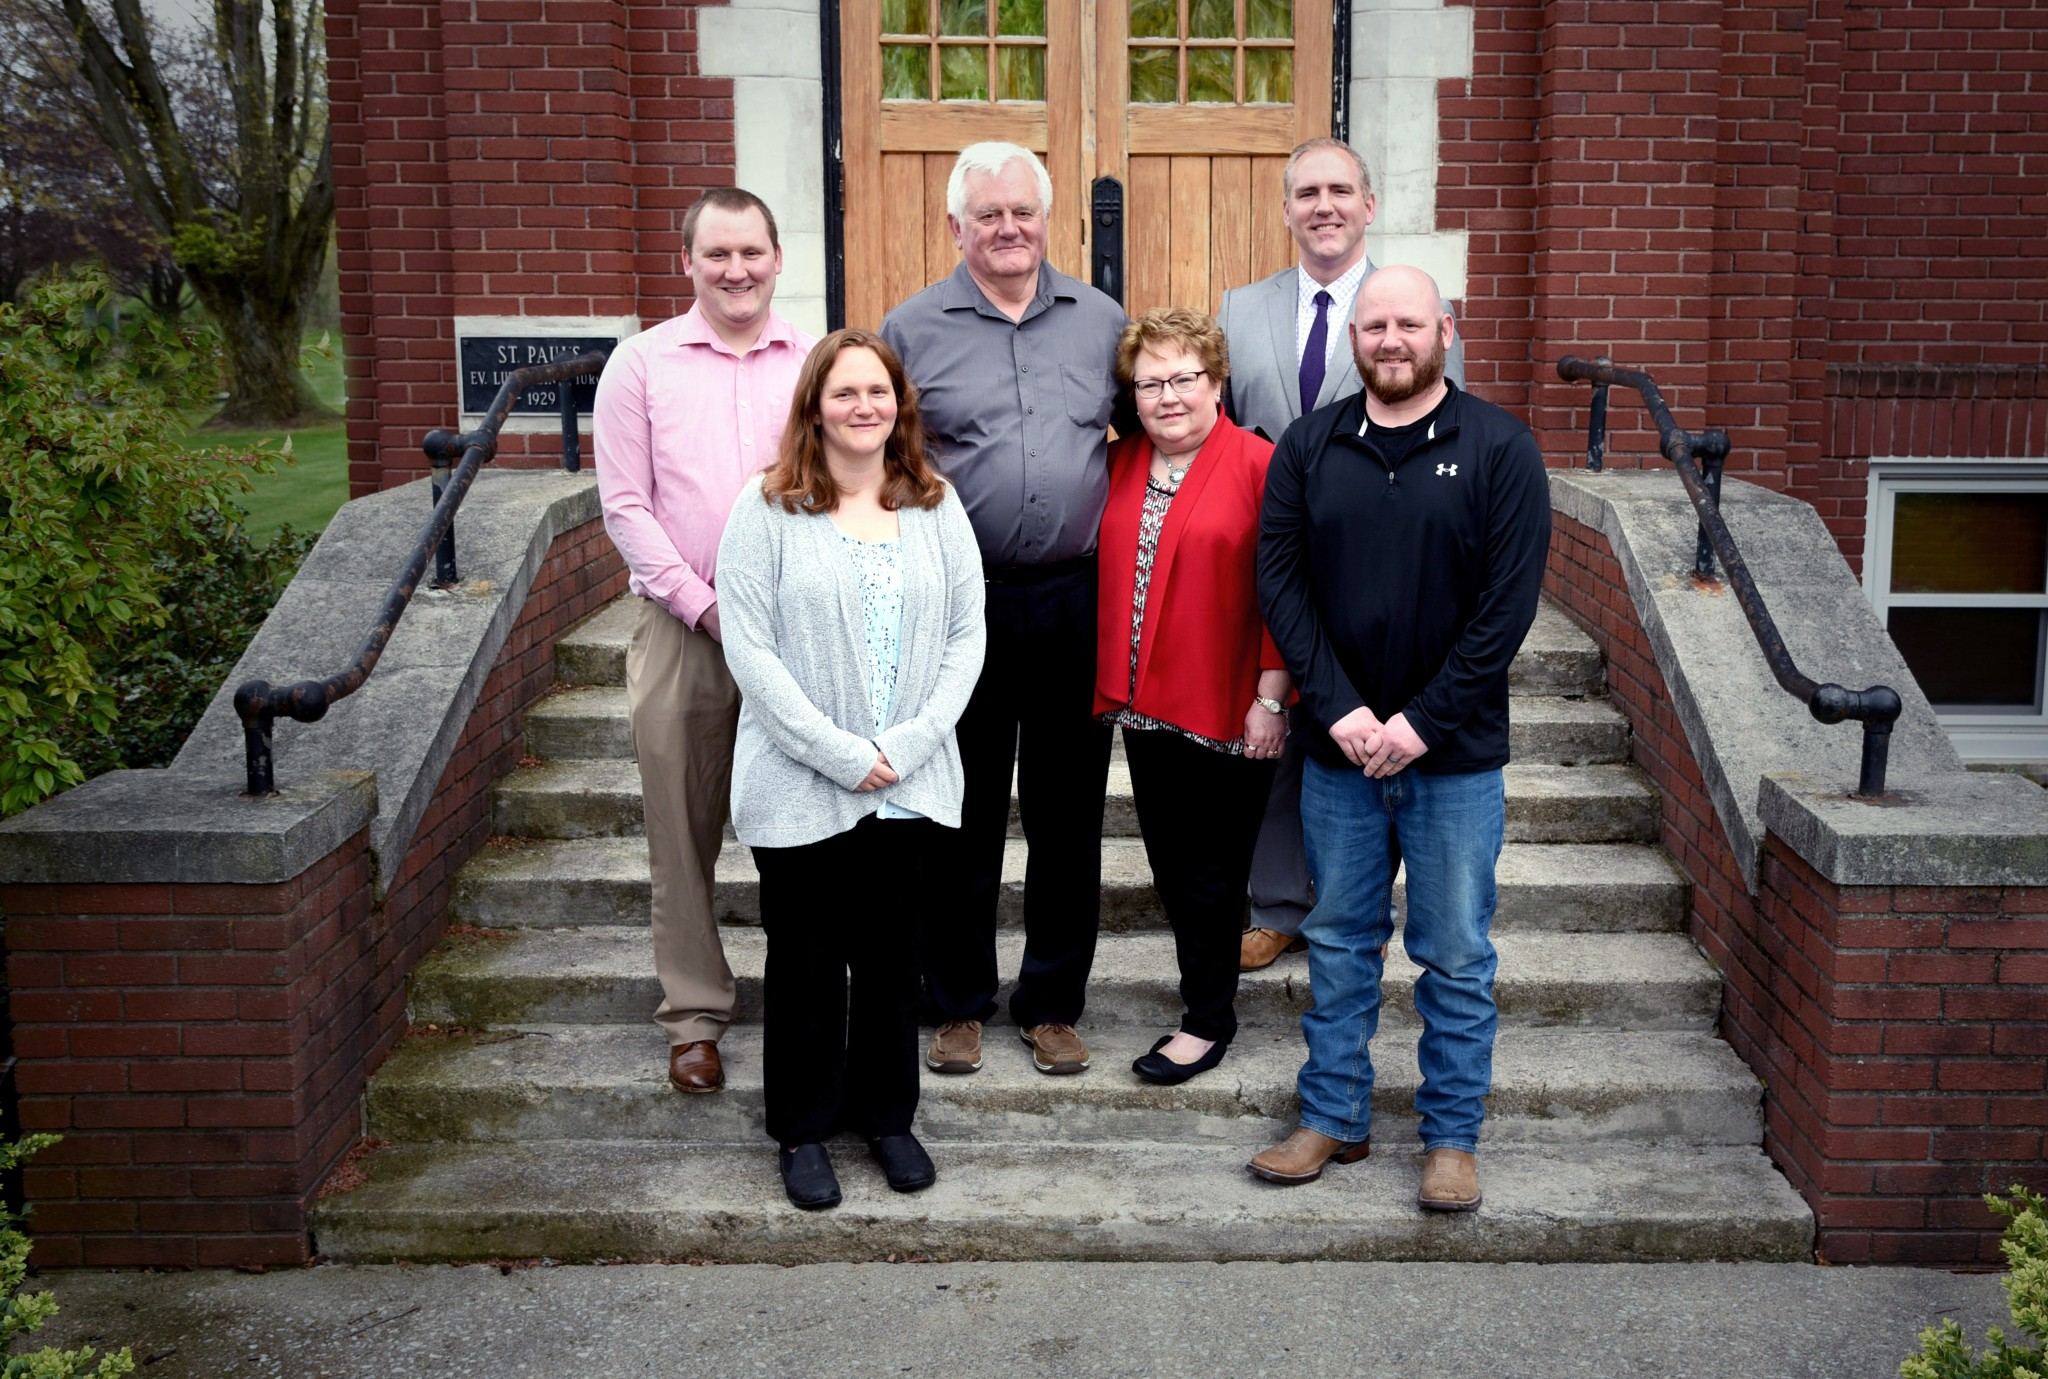 The immediate Frobose family — Back row- Zachary, Robert and Benjamin Frobose. Front row Abigail Frobose Wilcox, Elaine, and Jacob Frobose.